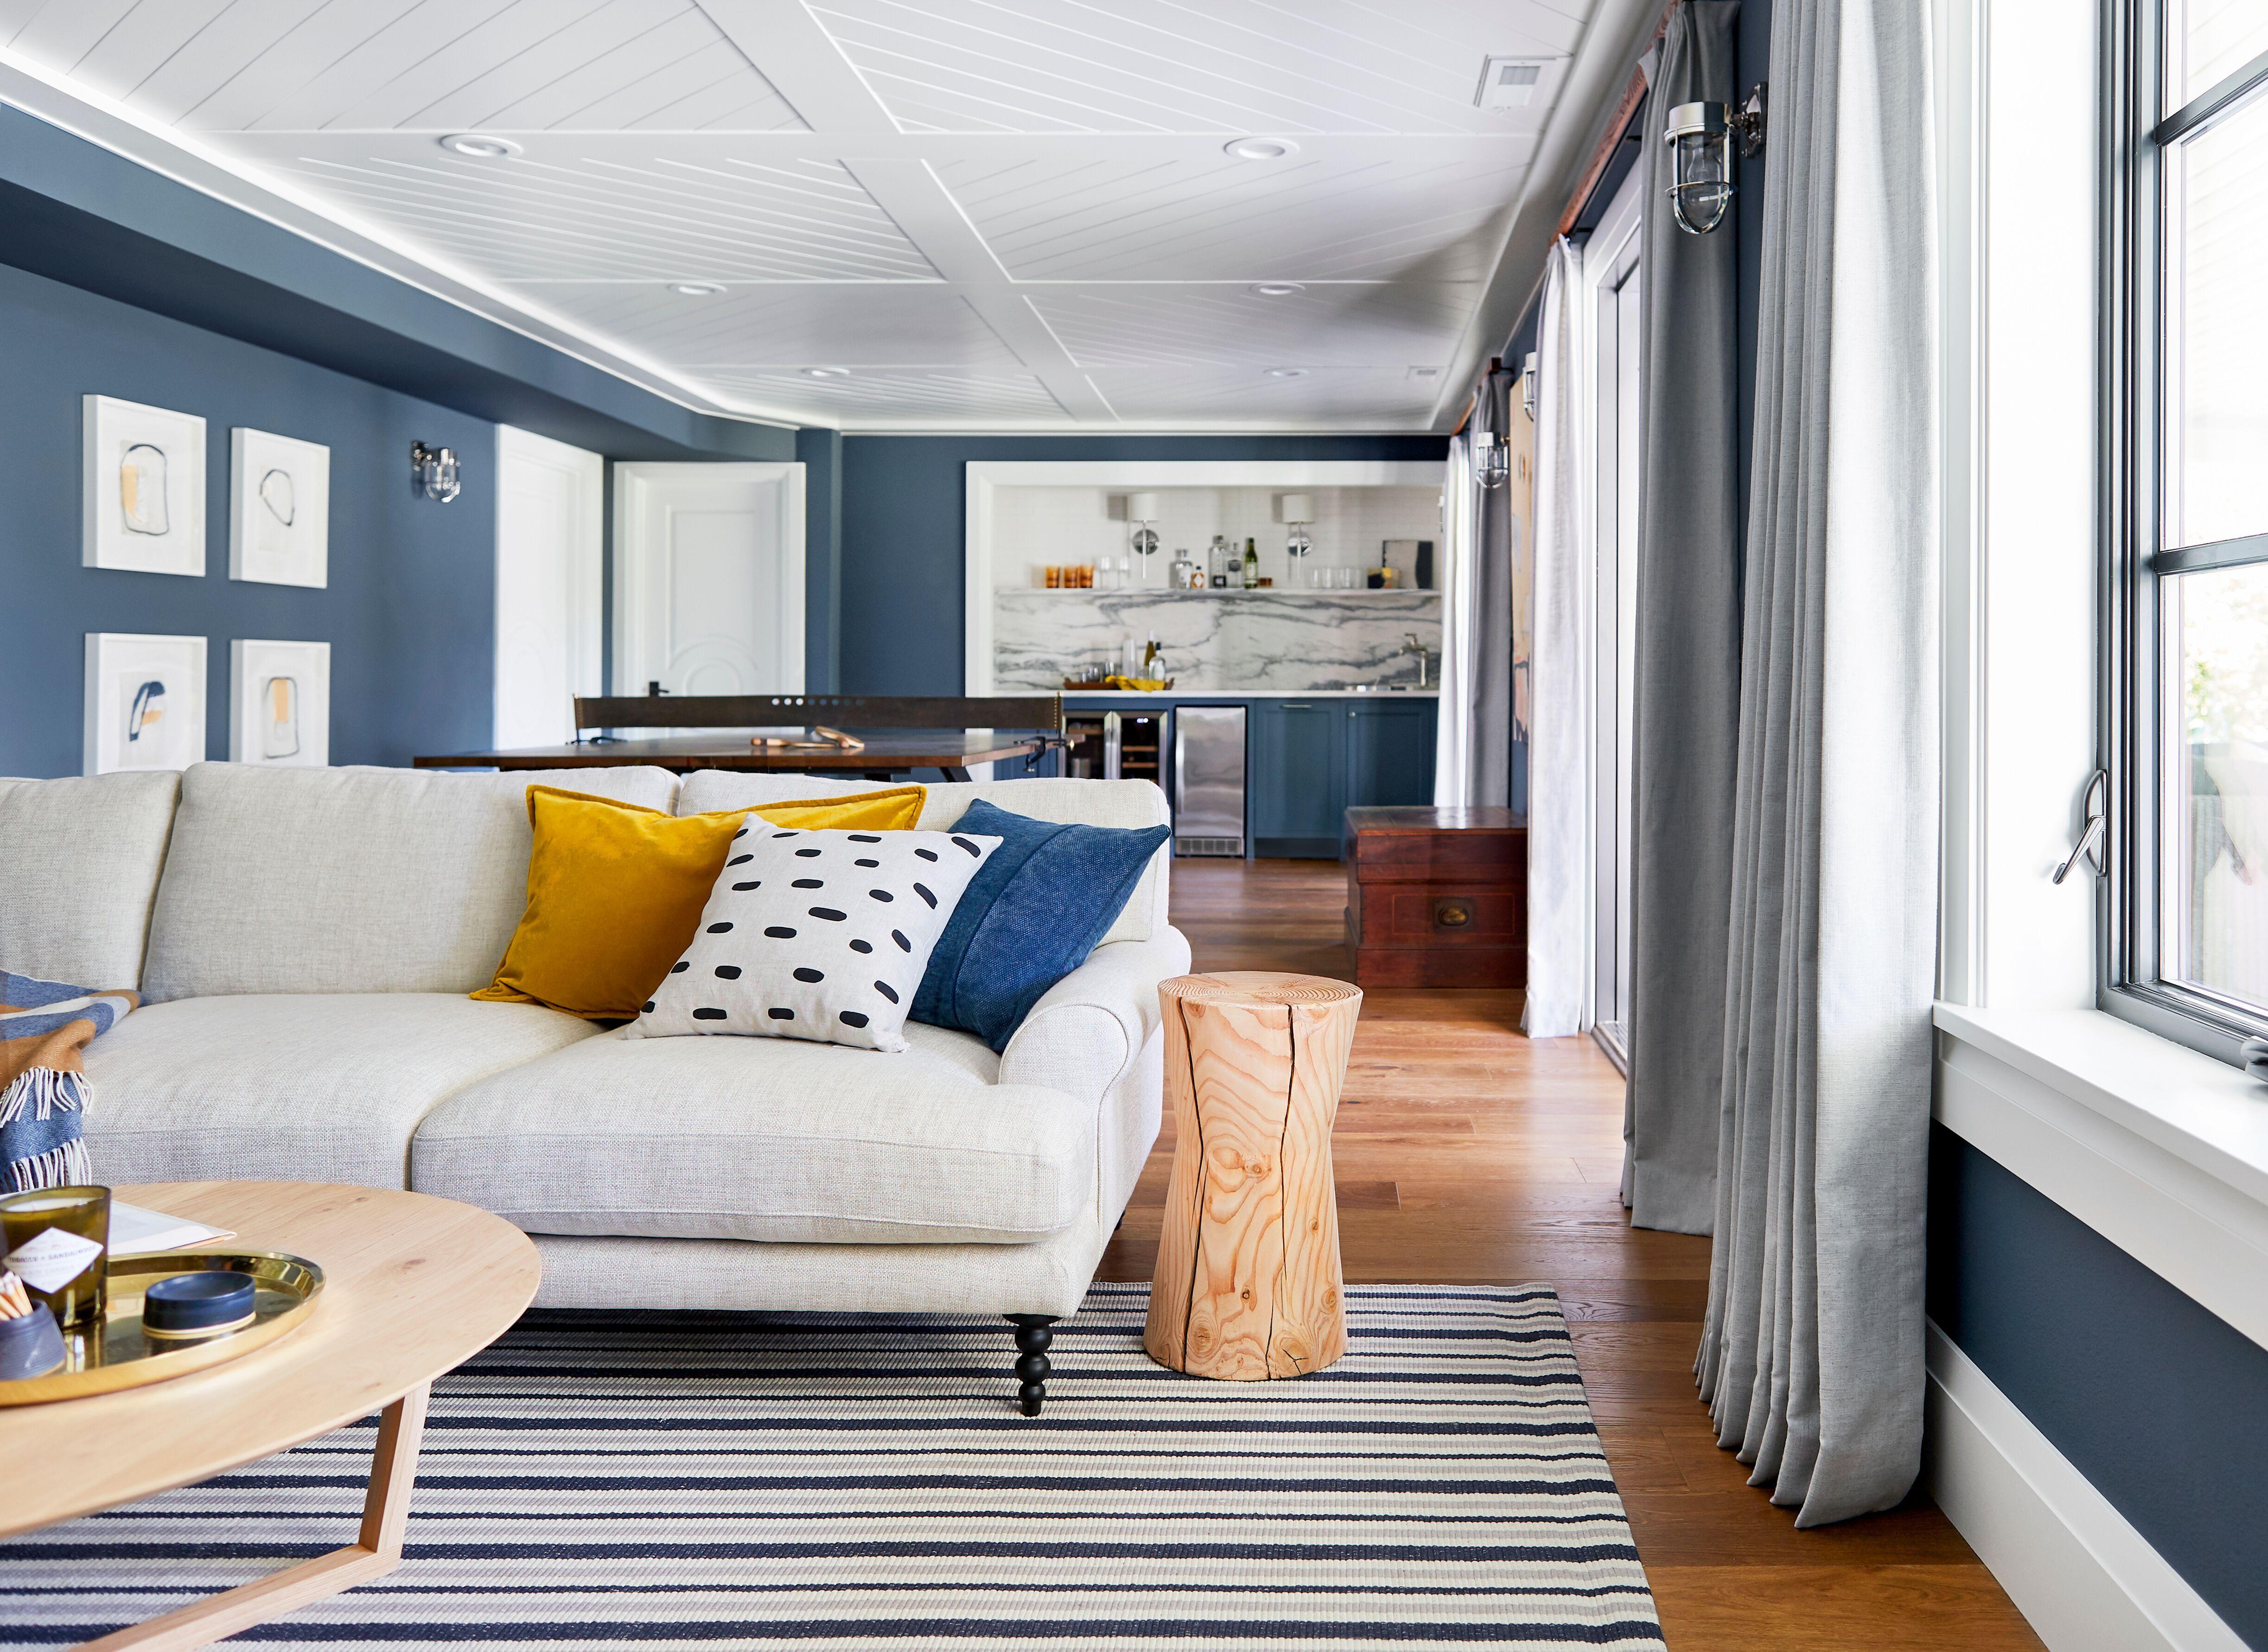 30 Stylish Family Room Design Ideas Easy Decorating Tips